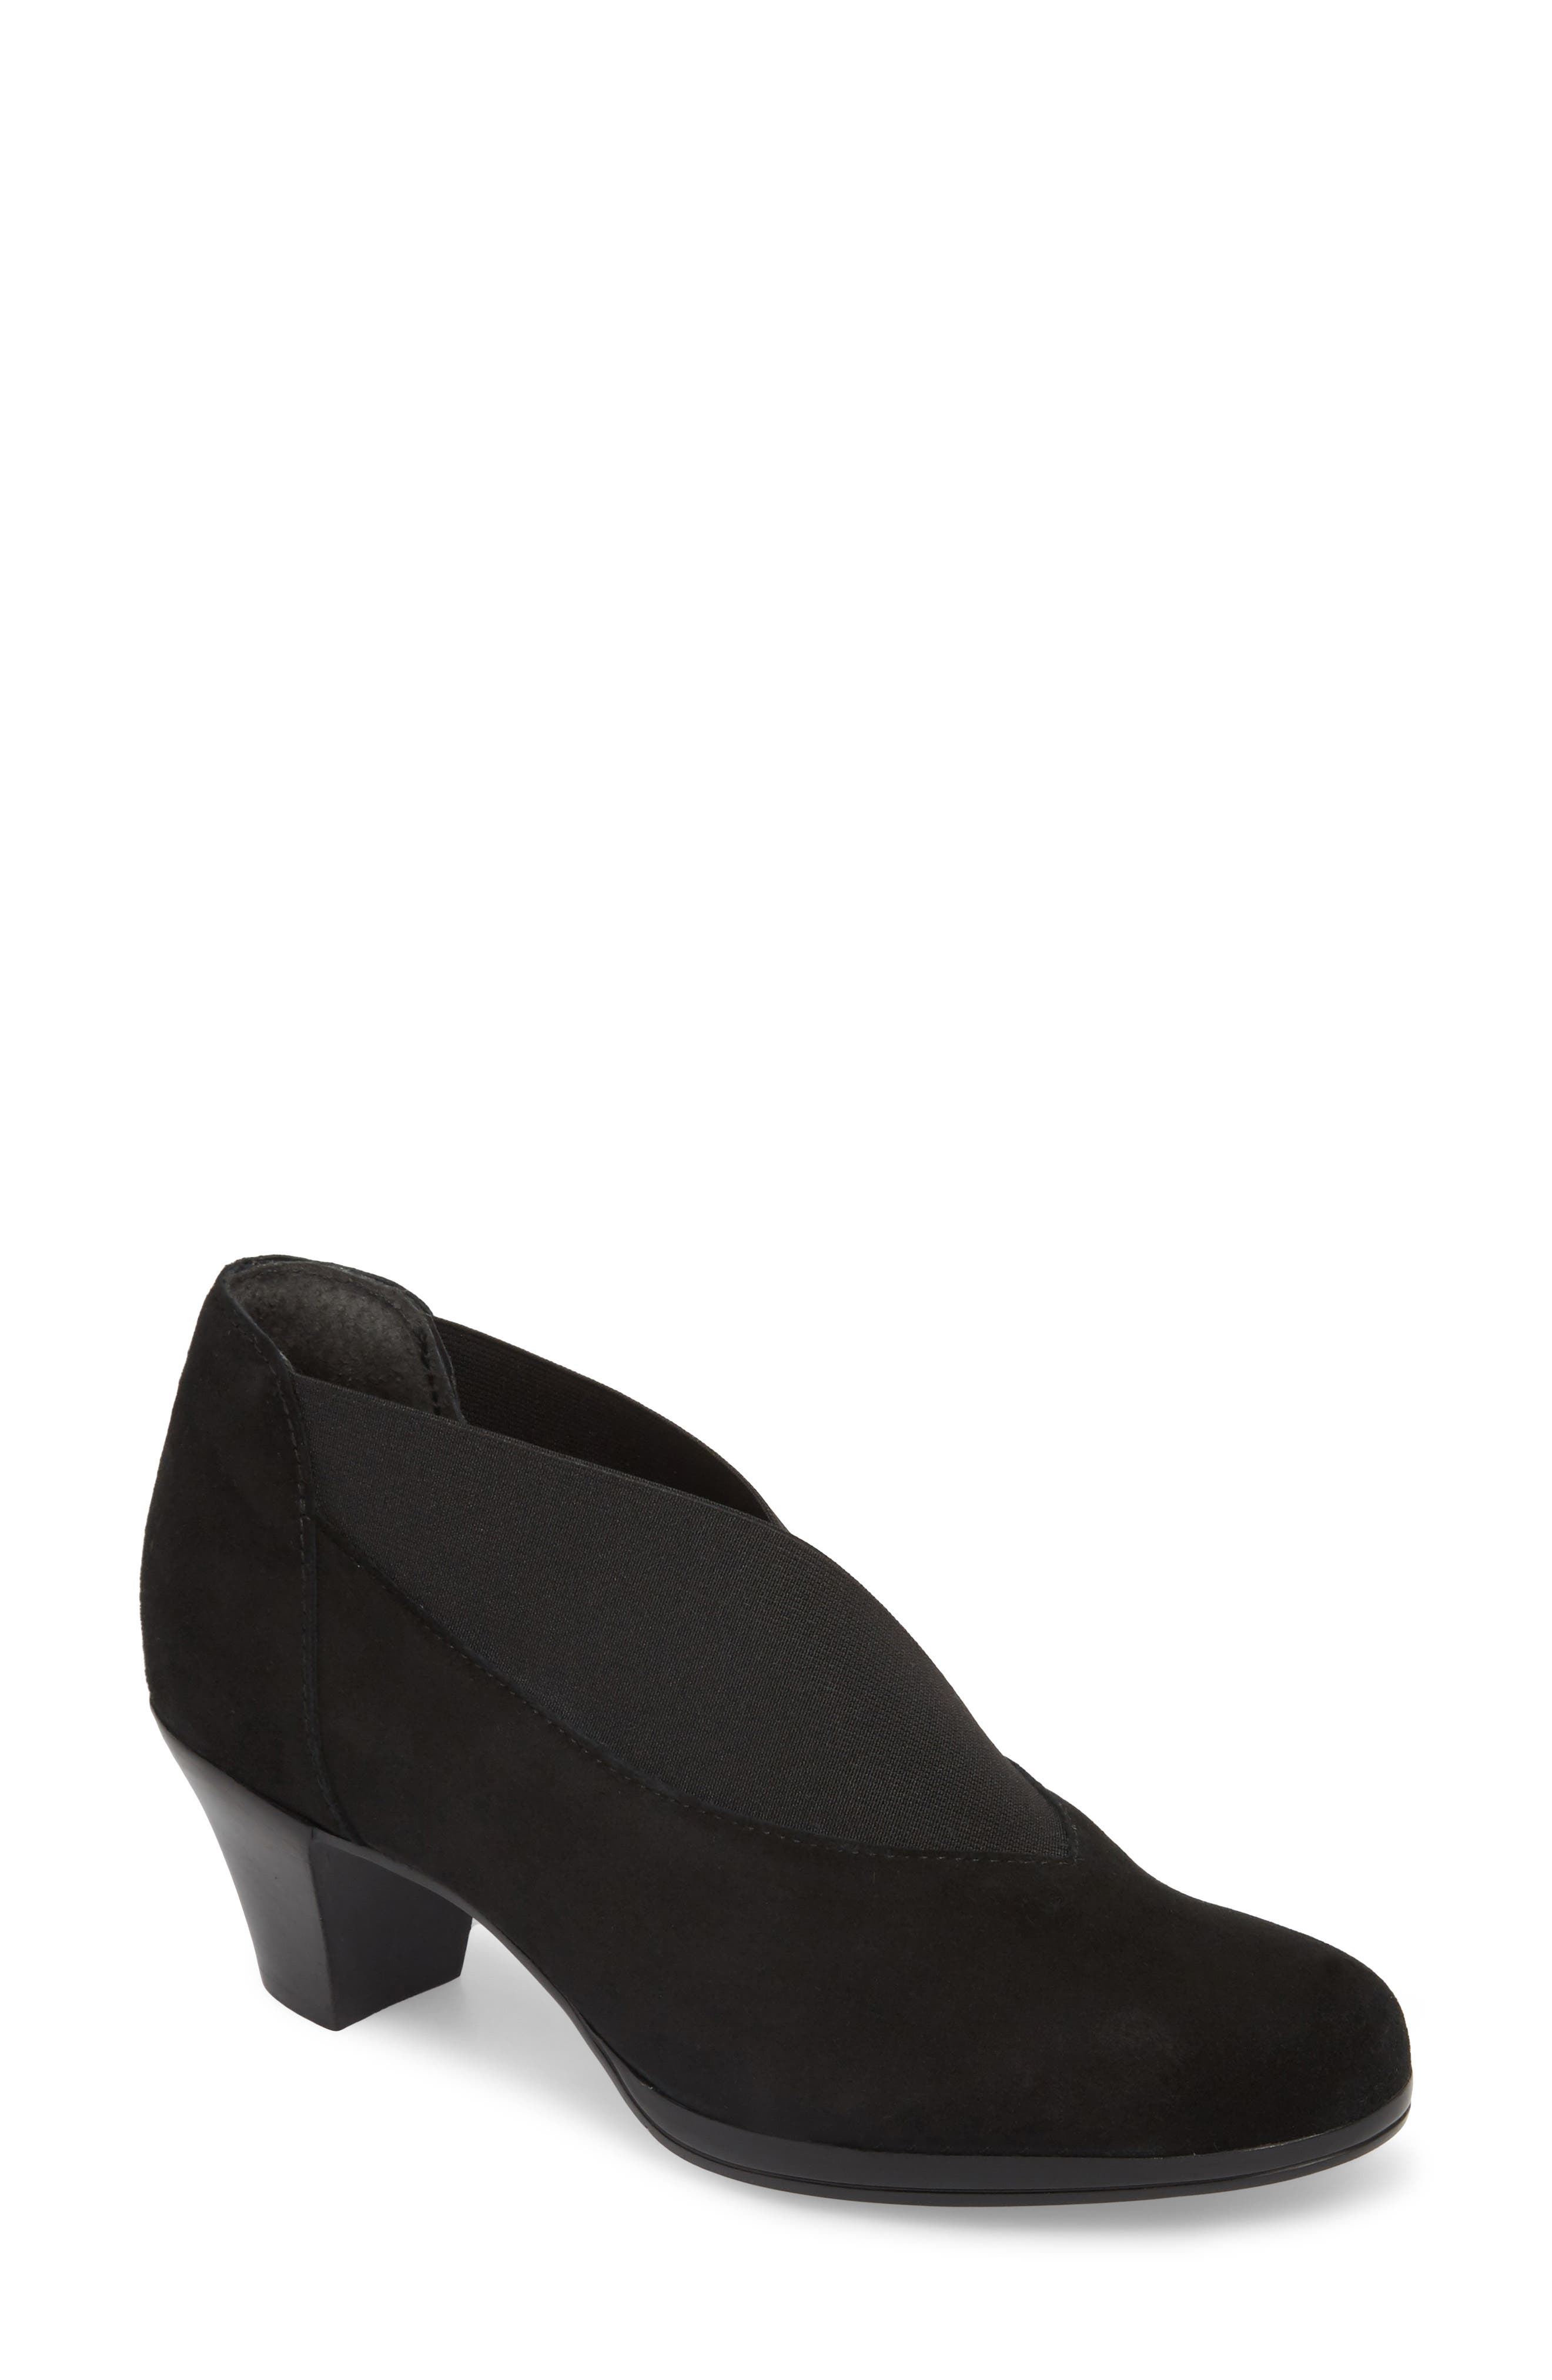 Munro Francee Boot- Black